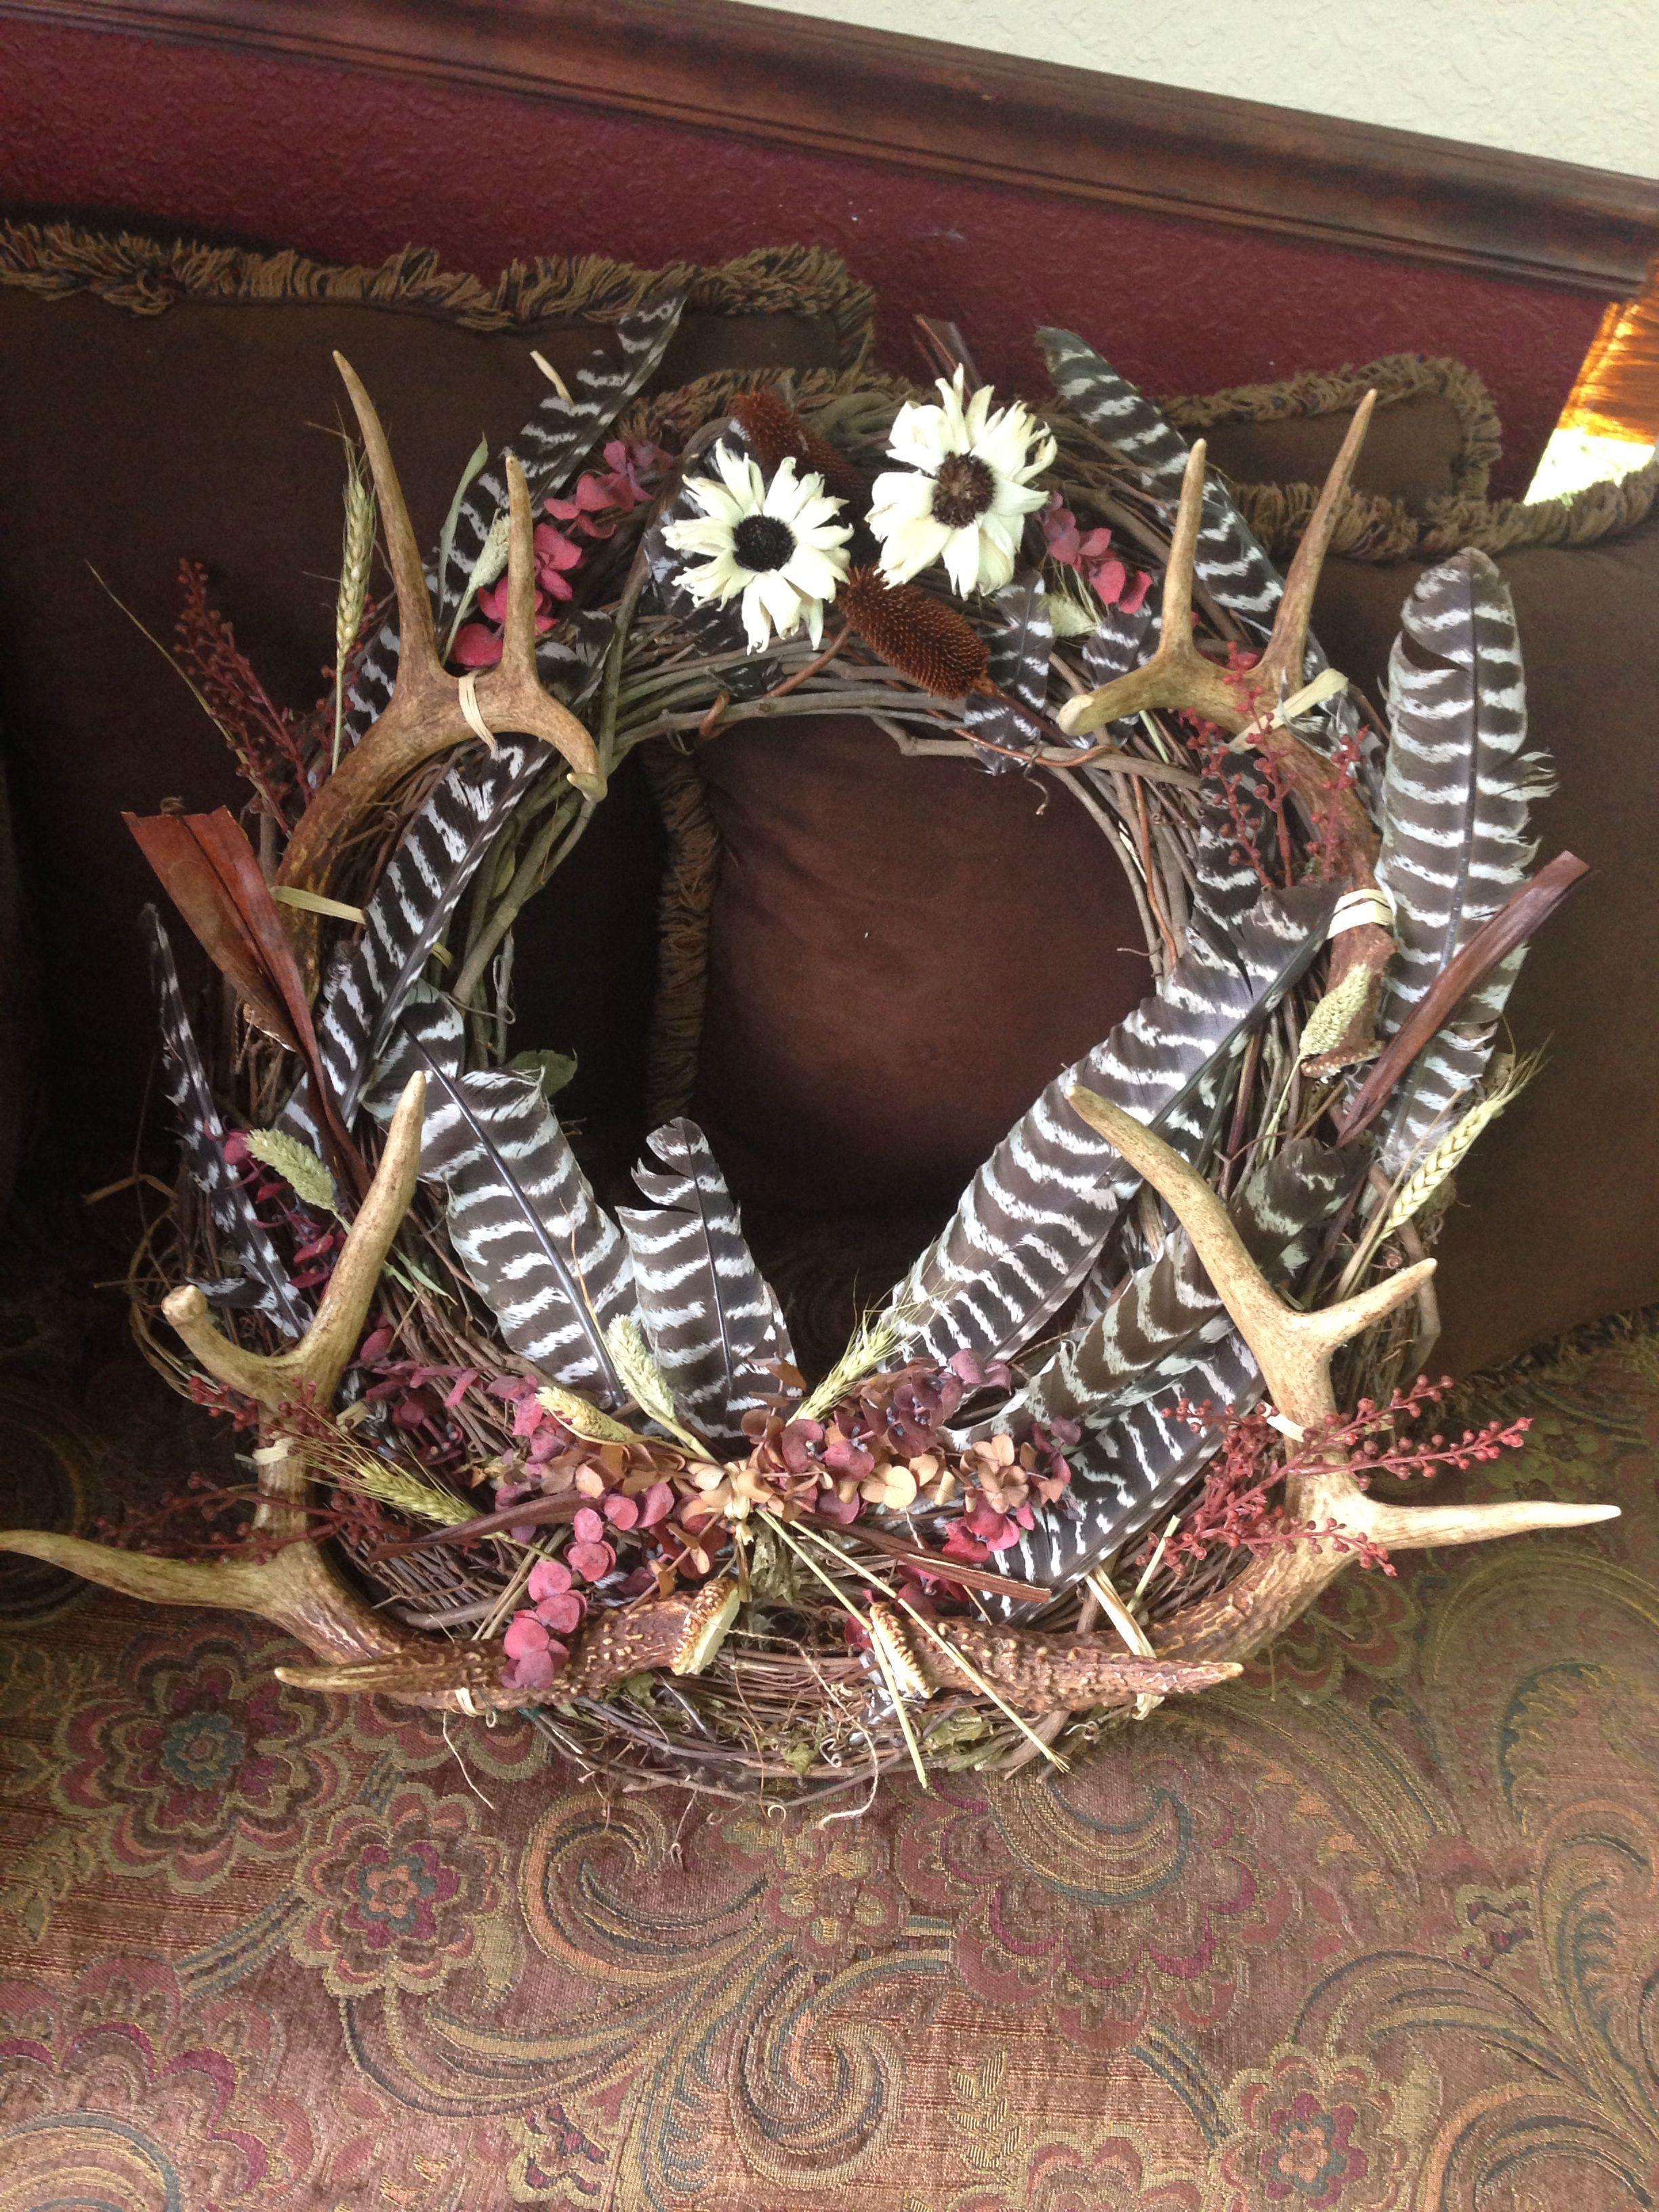 Deer Antler Wreath Art Design Update Pictures And Images